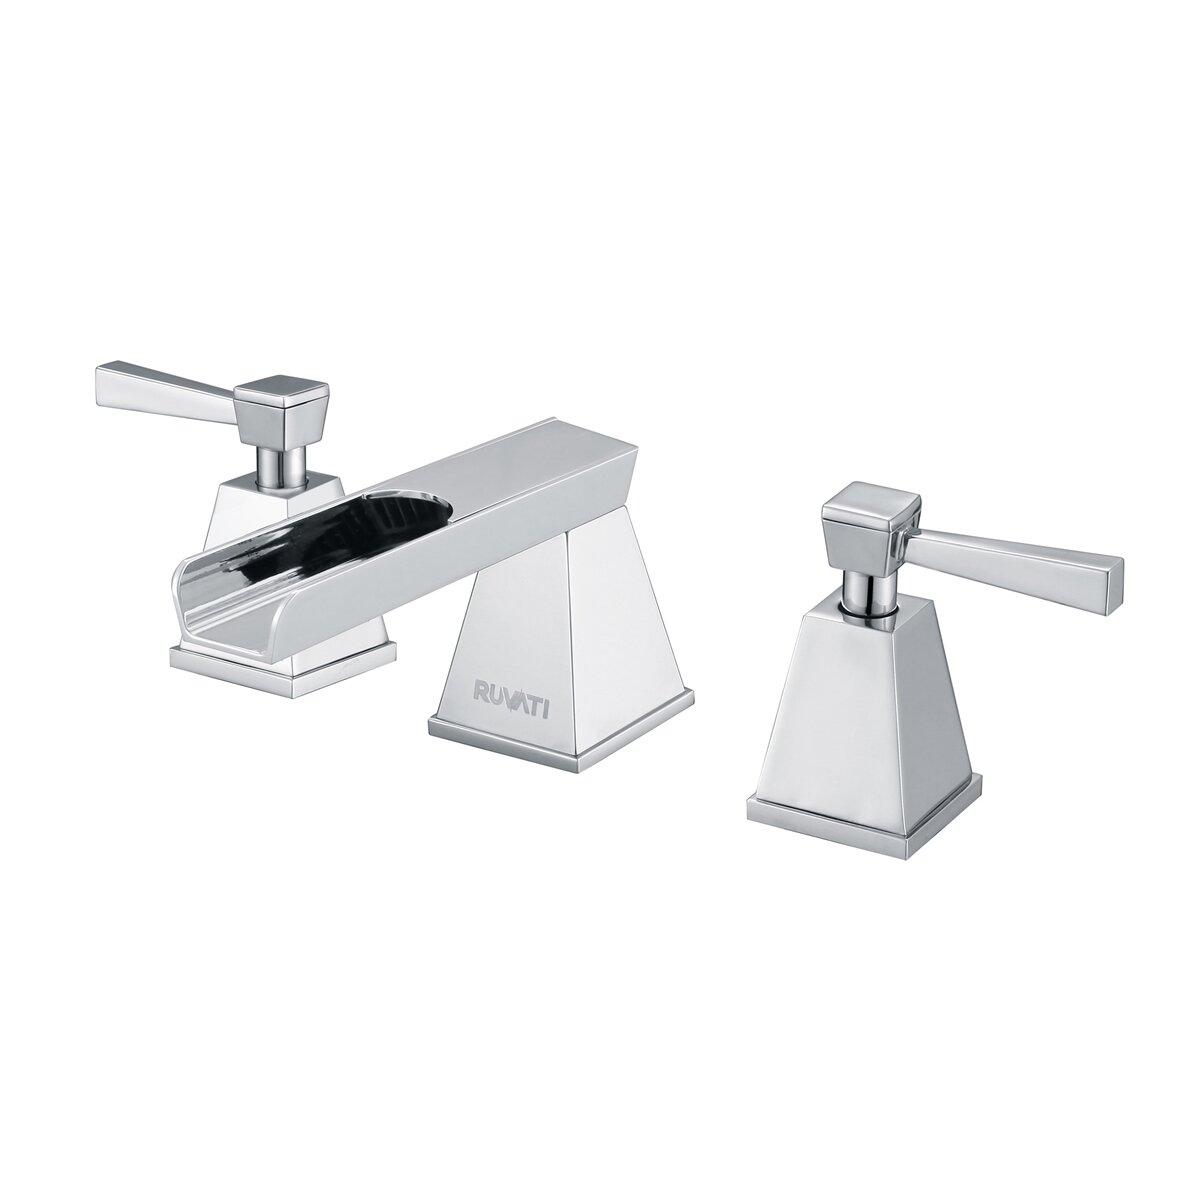 Ruvati waterfall double handle widespread bathroom faucet reviews wayfair for Bathroom sink faucets reviews